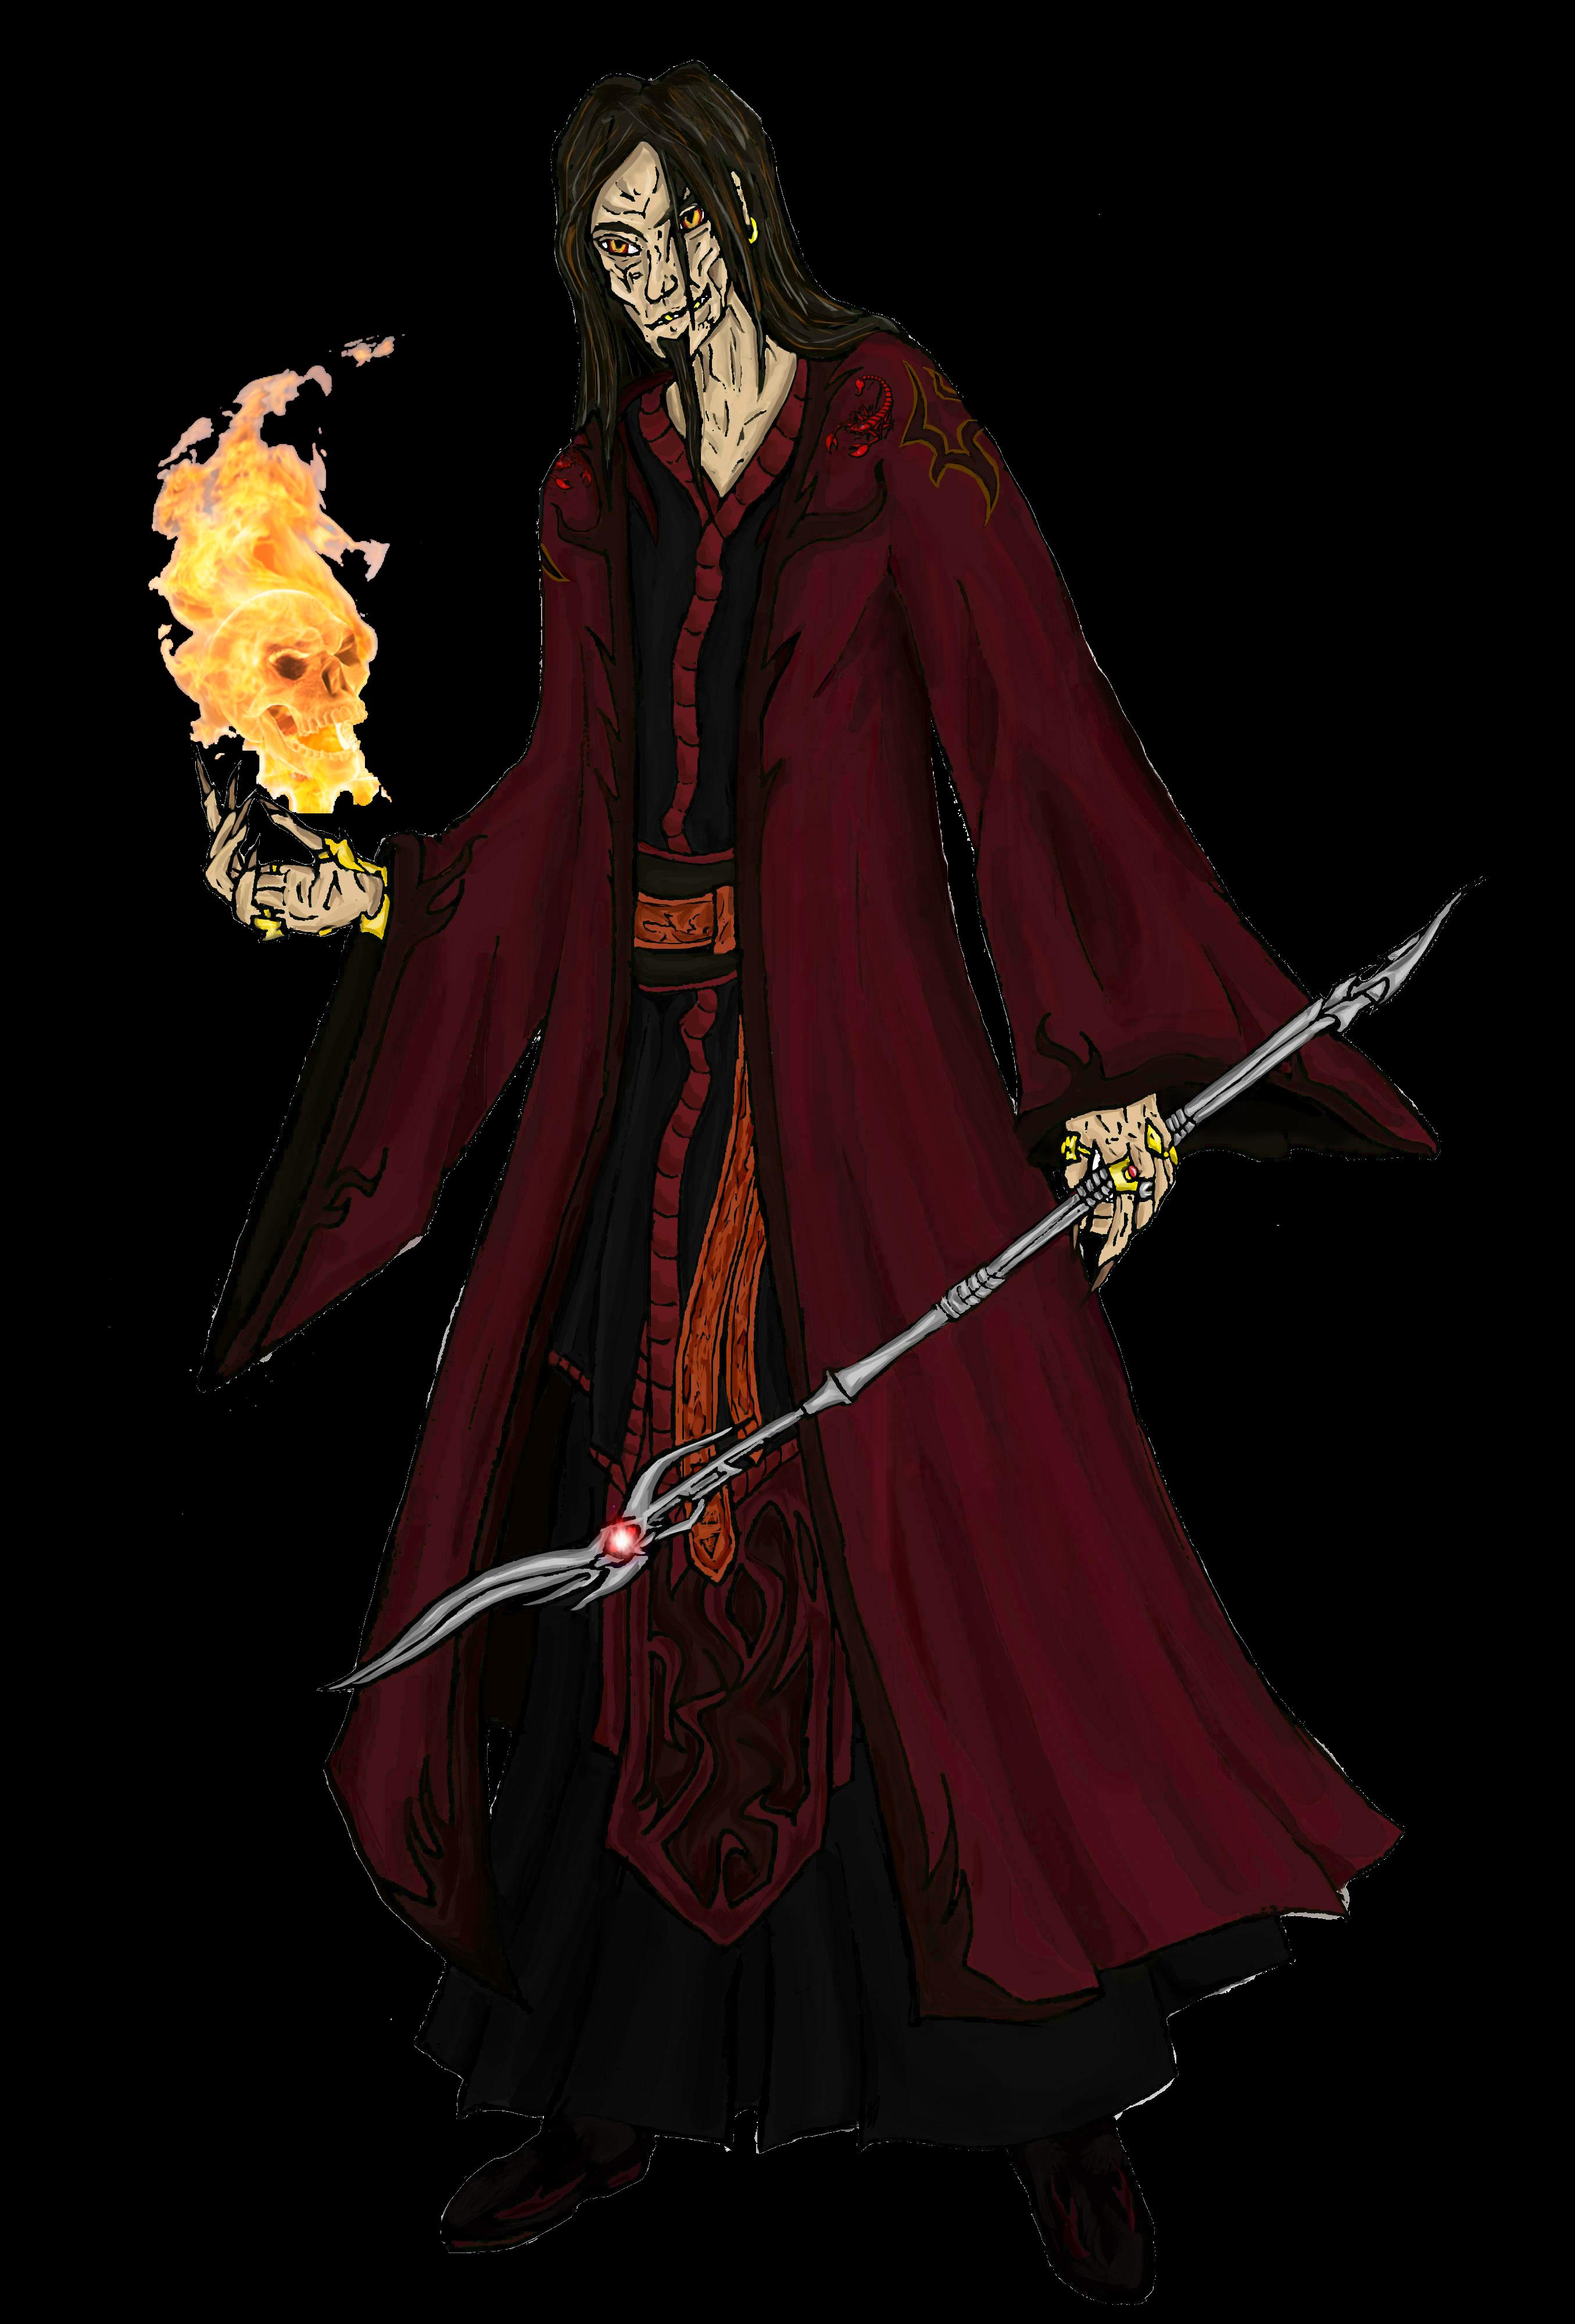 http://orig10.deviantart.net/6266/f/2015/174/7/6/sorcerer_warlock_negzul___remake_in_color_by_lordplegeus-d8xxe62.png